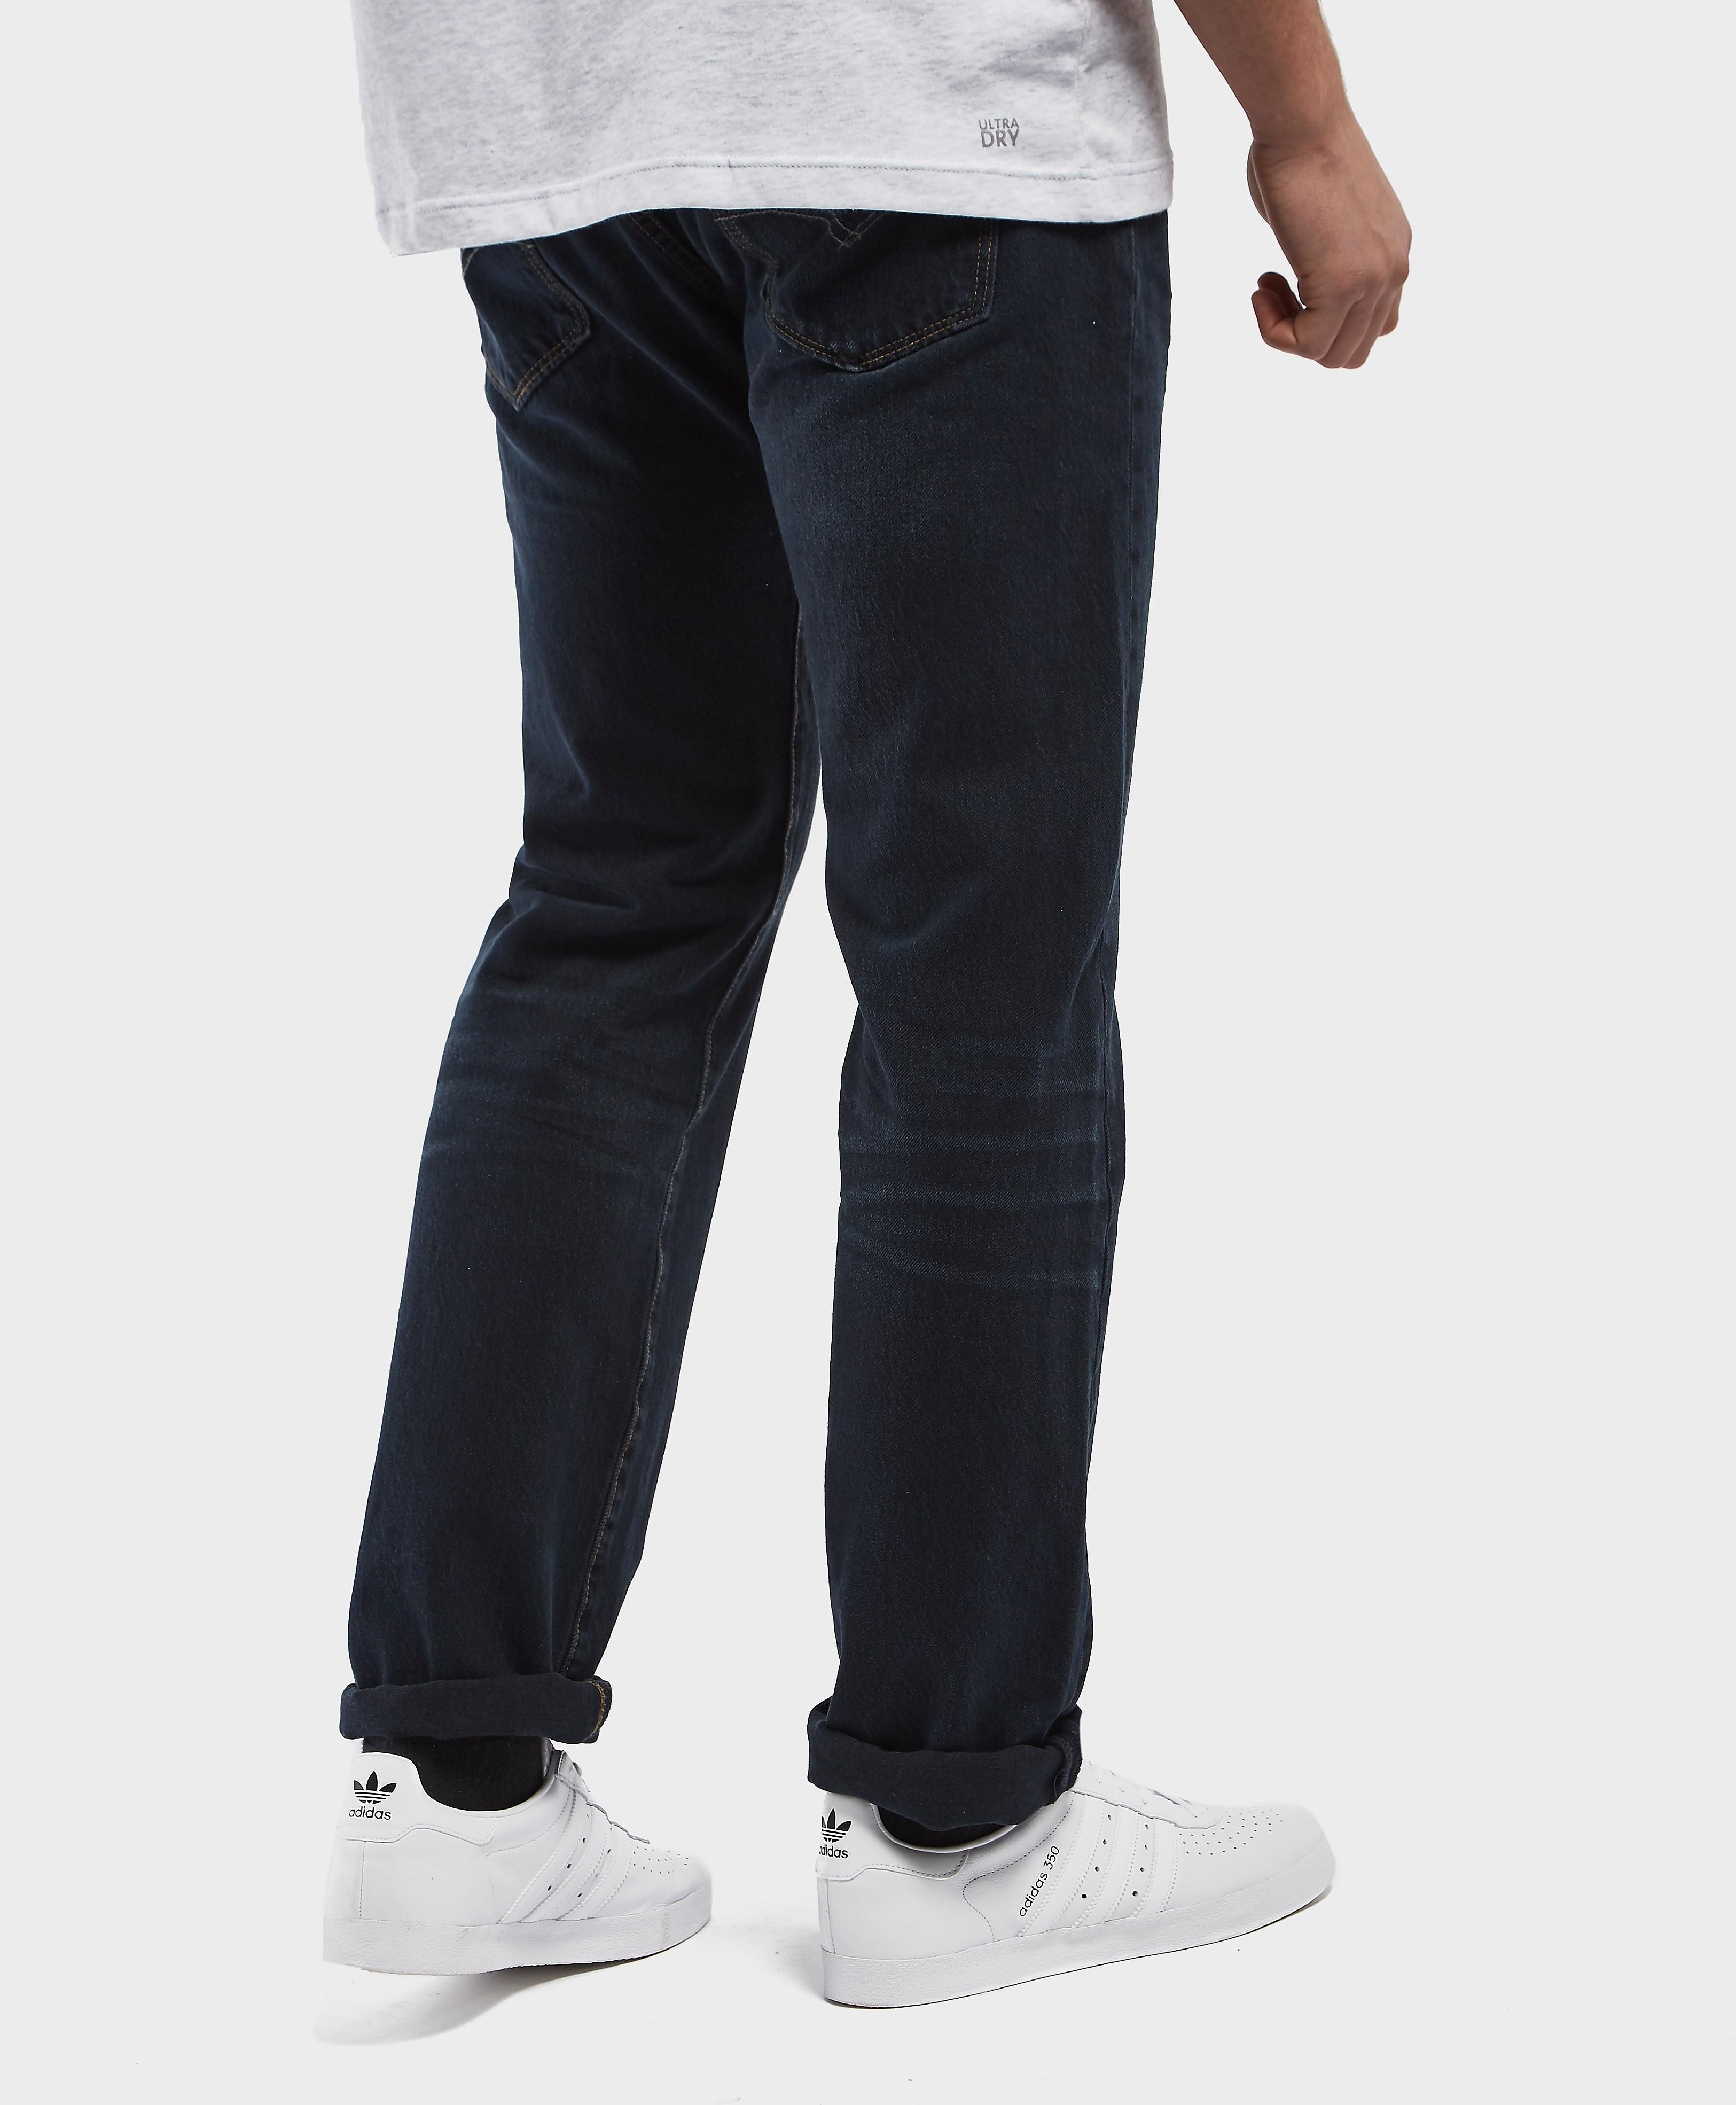 Levis 501 Regular Jeans